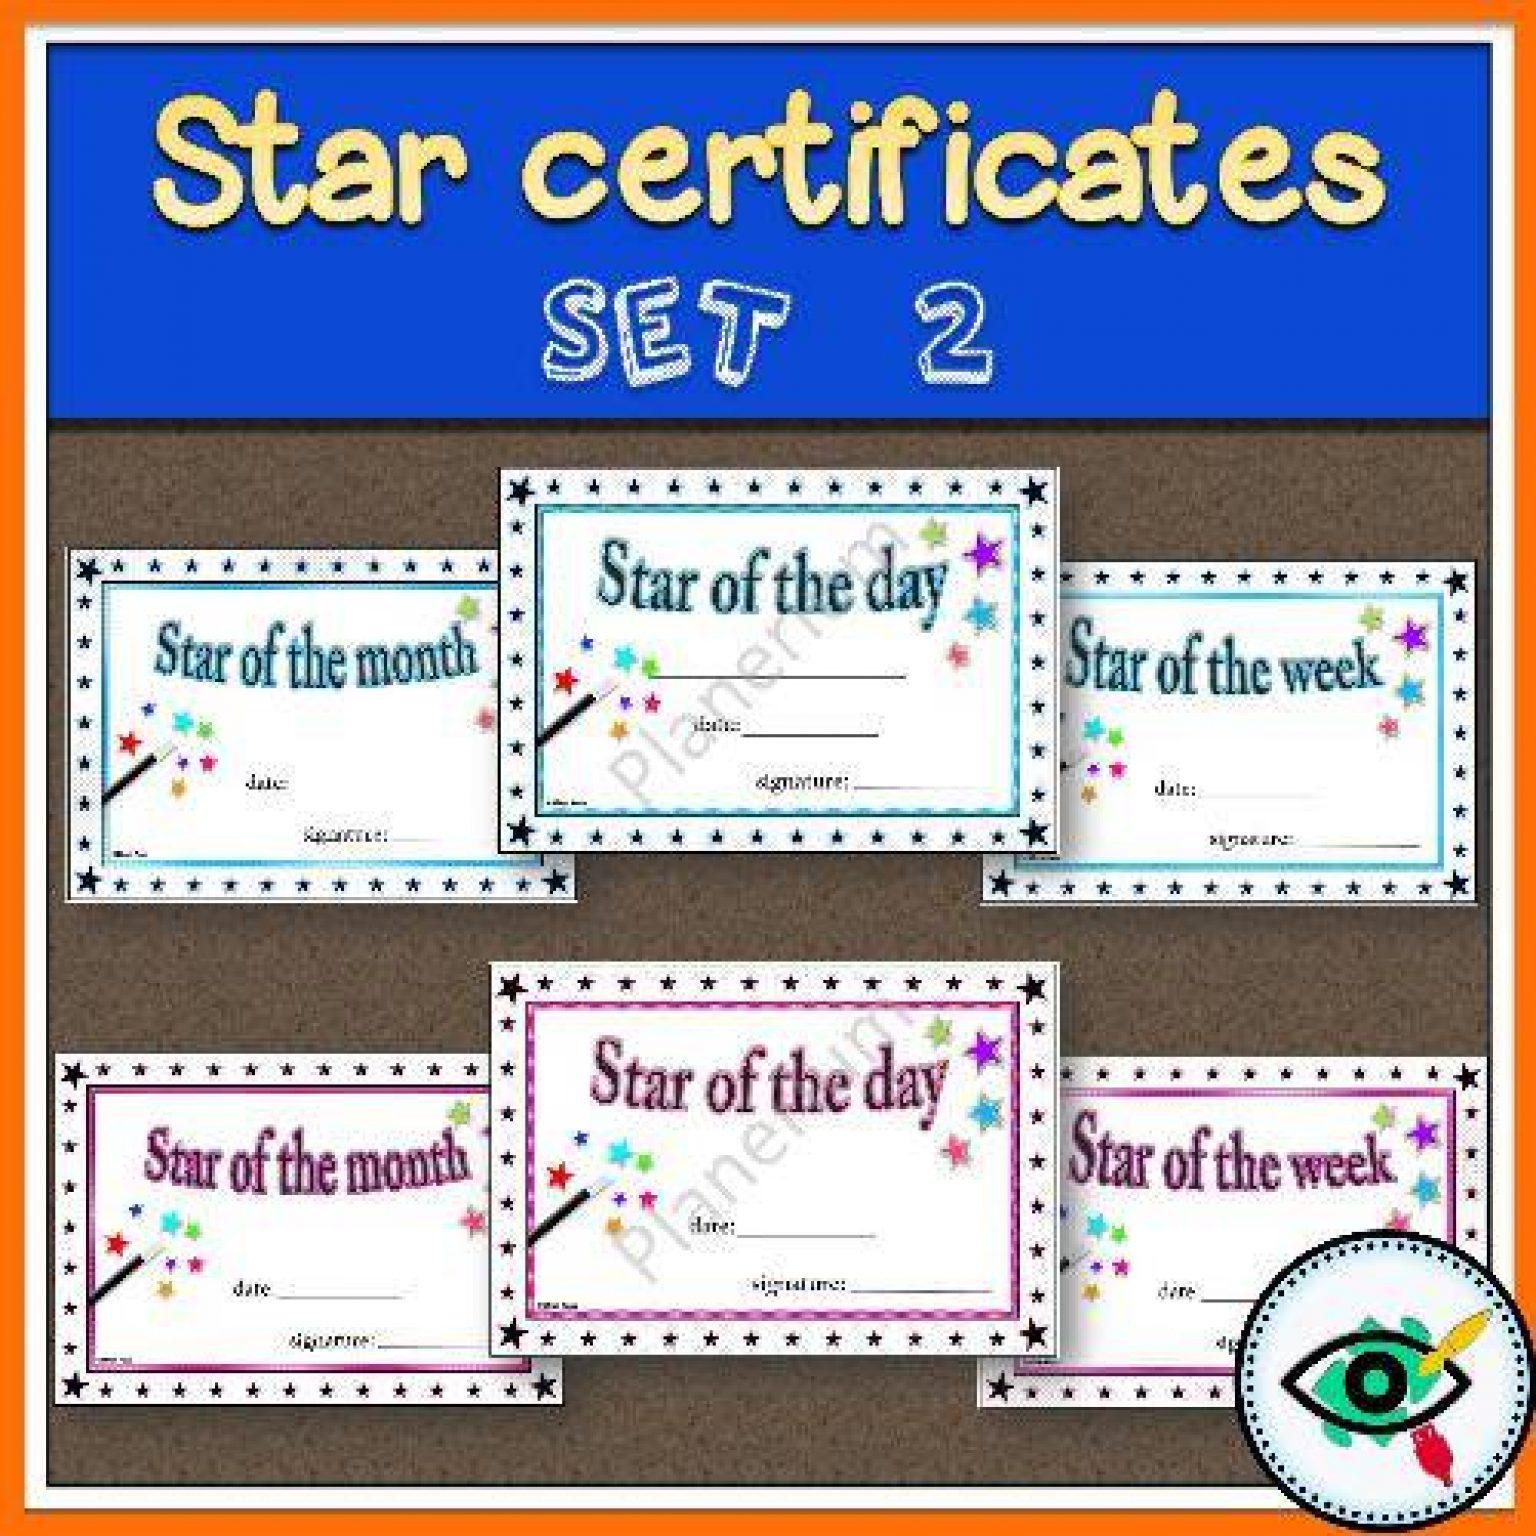 awards_rewards-star-certificates-g2-6-title2_resized